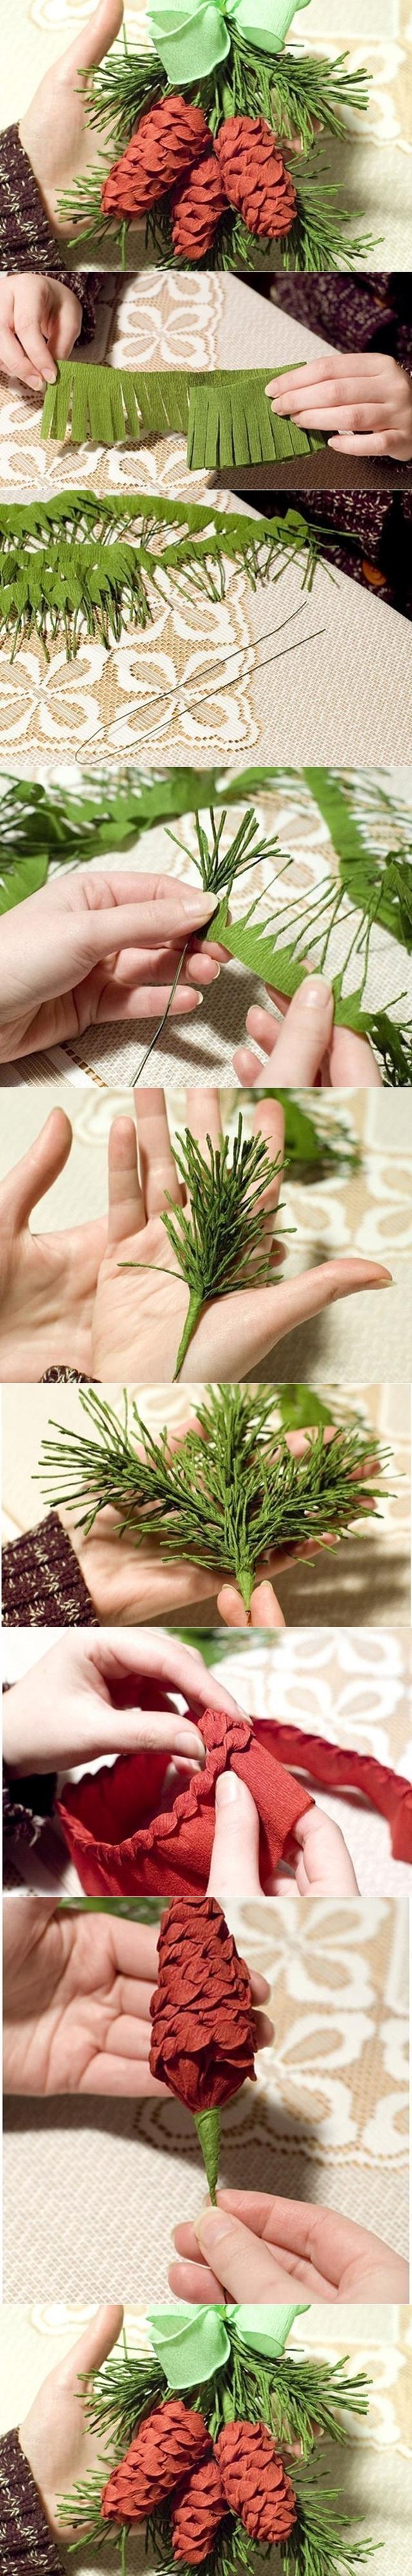 crepe papaer pine cone tutorial